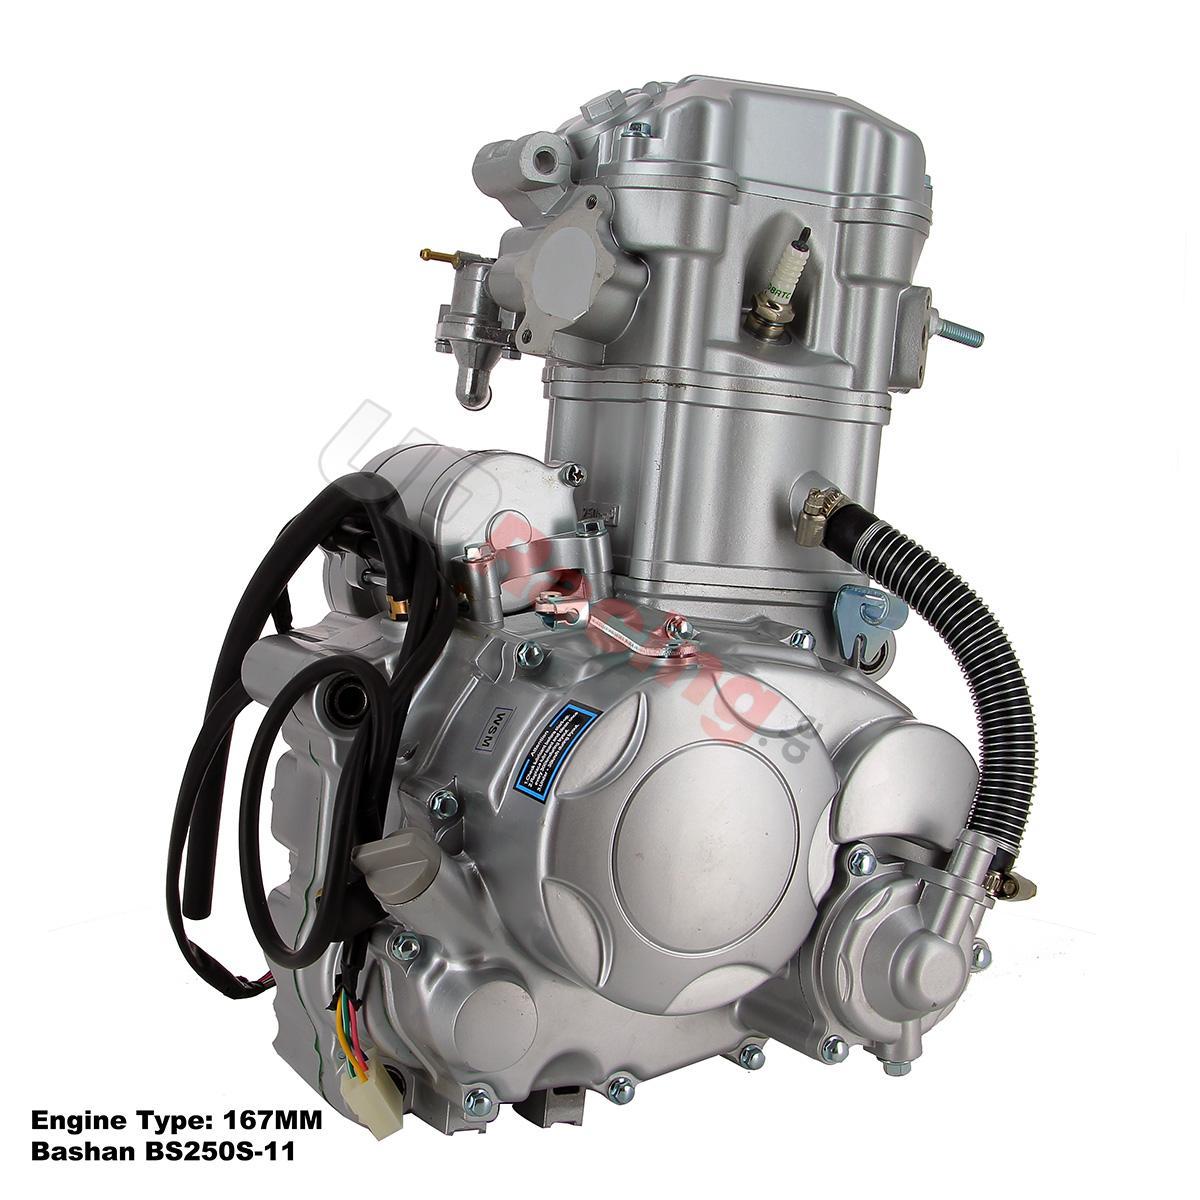 Motor Komplett 167mm F R Quad Bashan 250 Ccm Bs250s 11